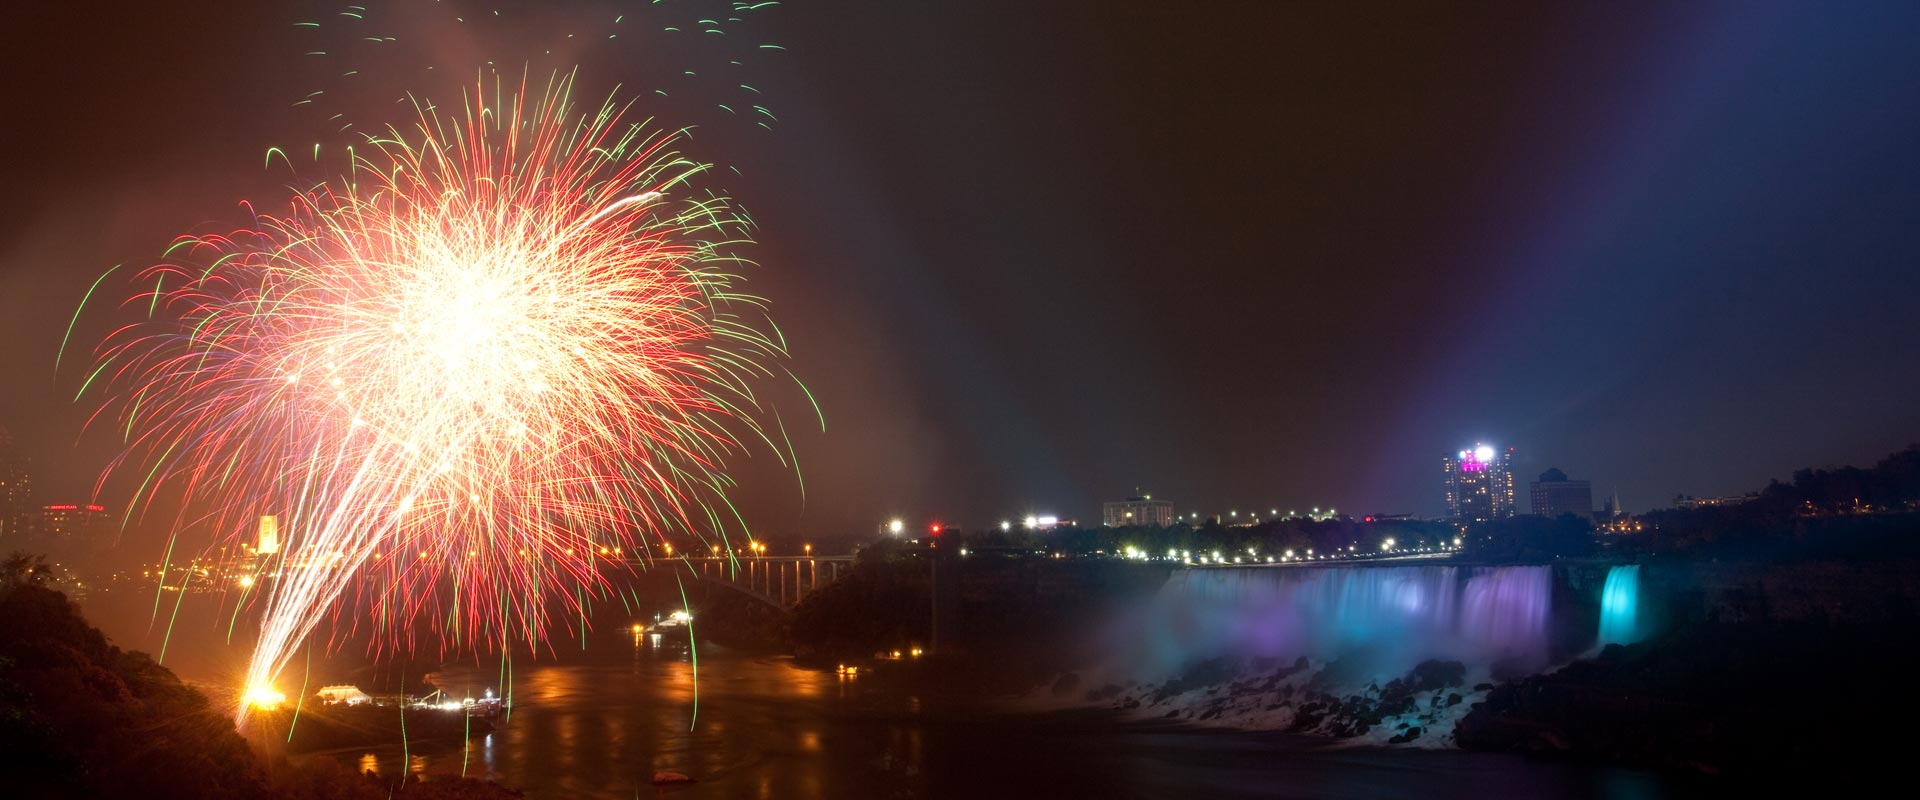 Niagara Falls Summer Fireworks 2019